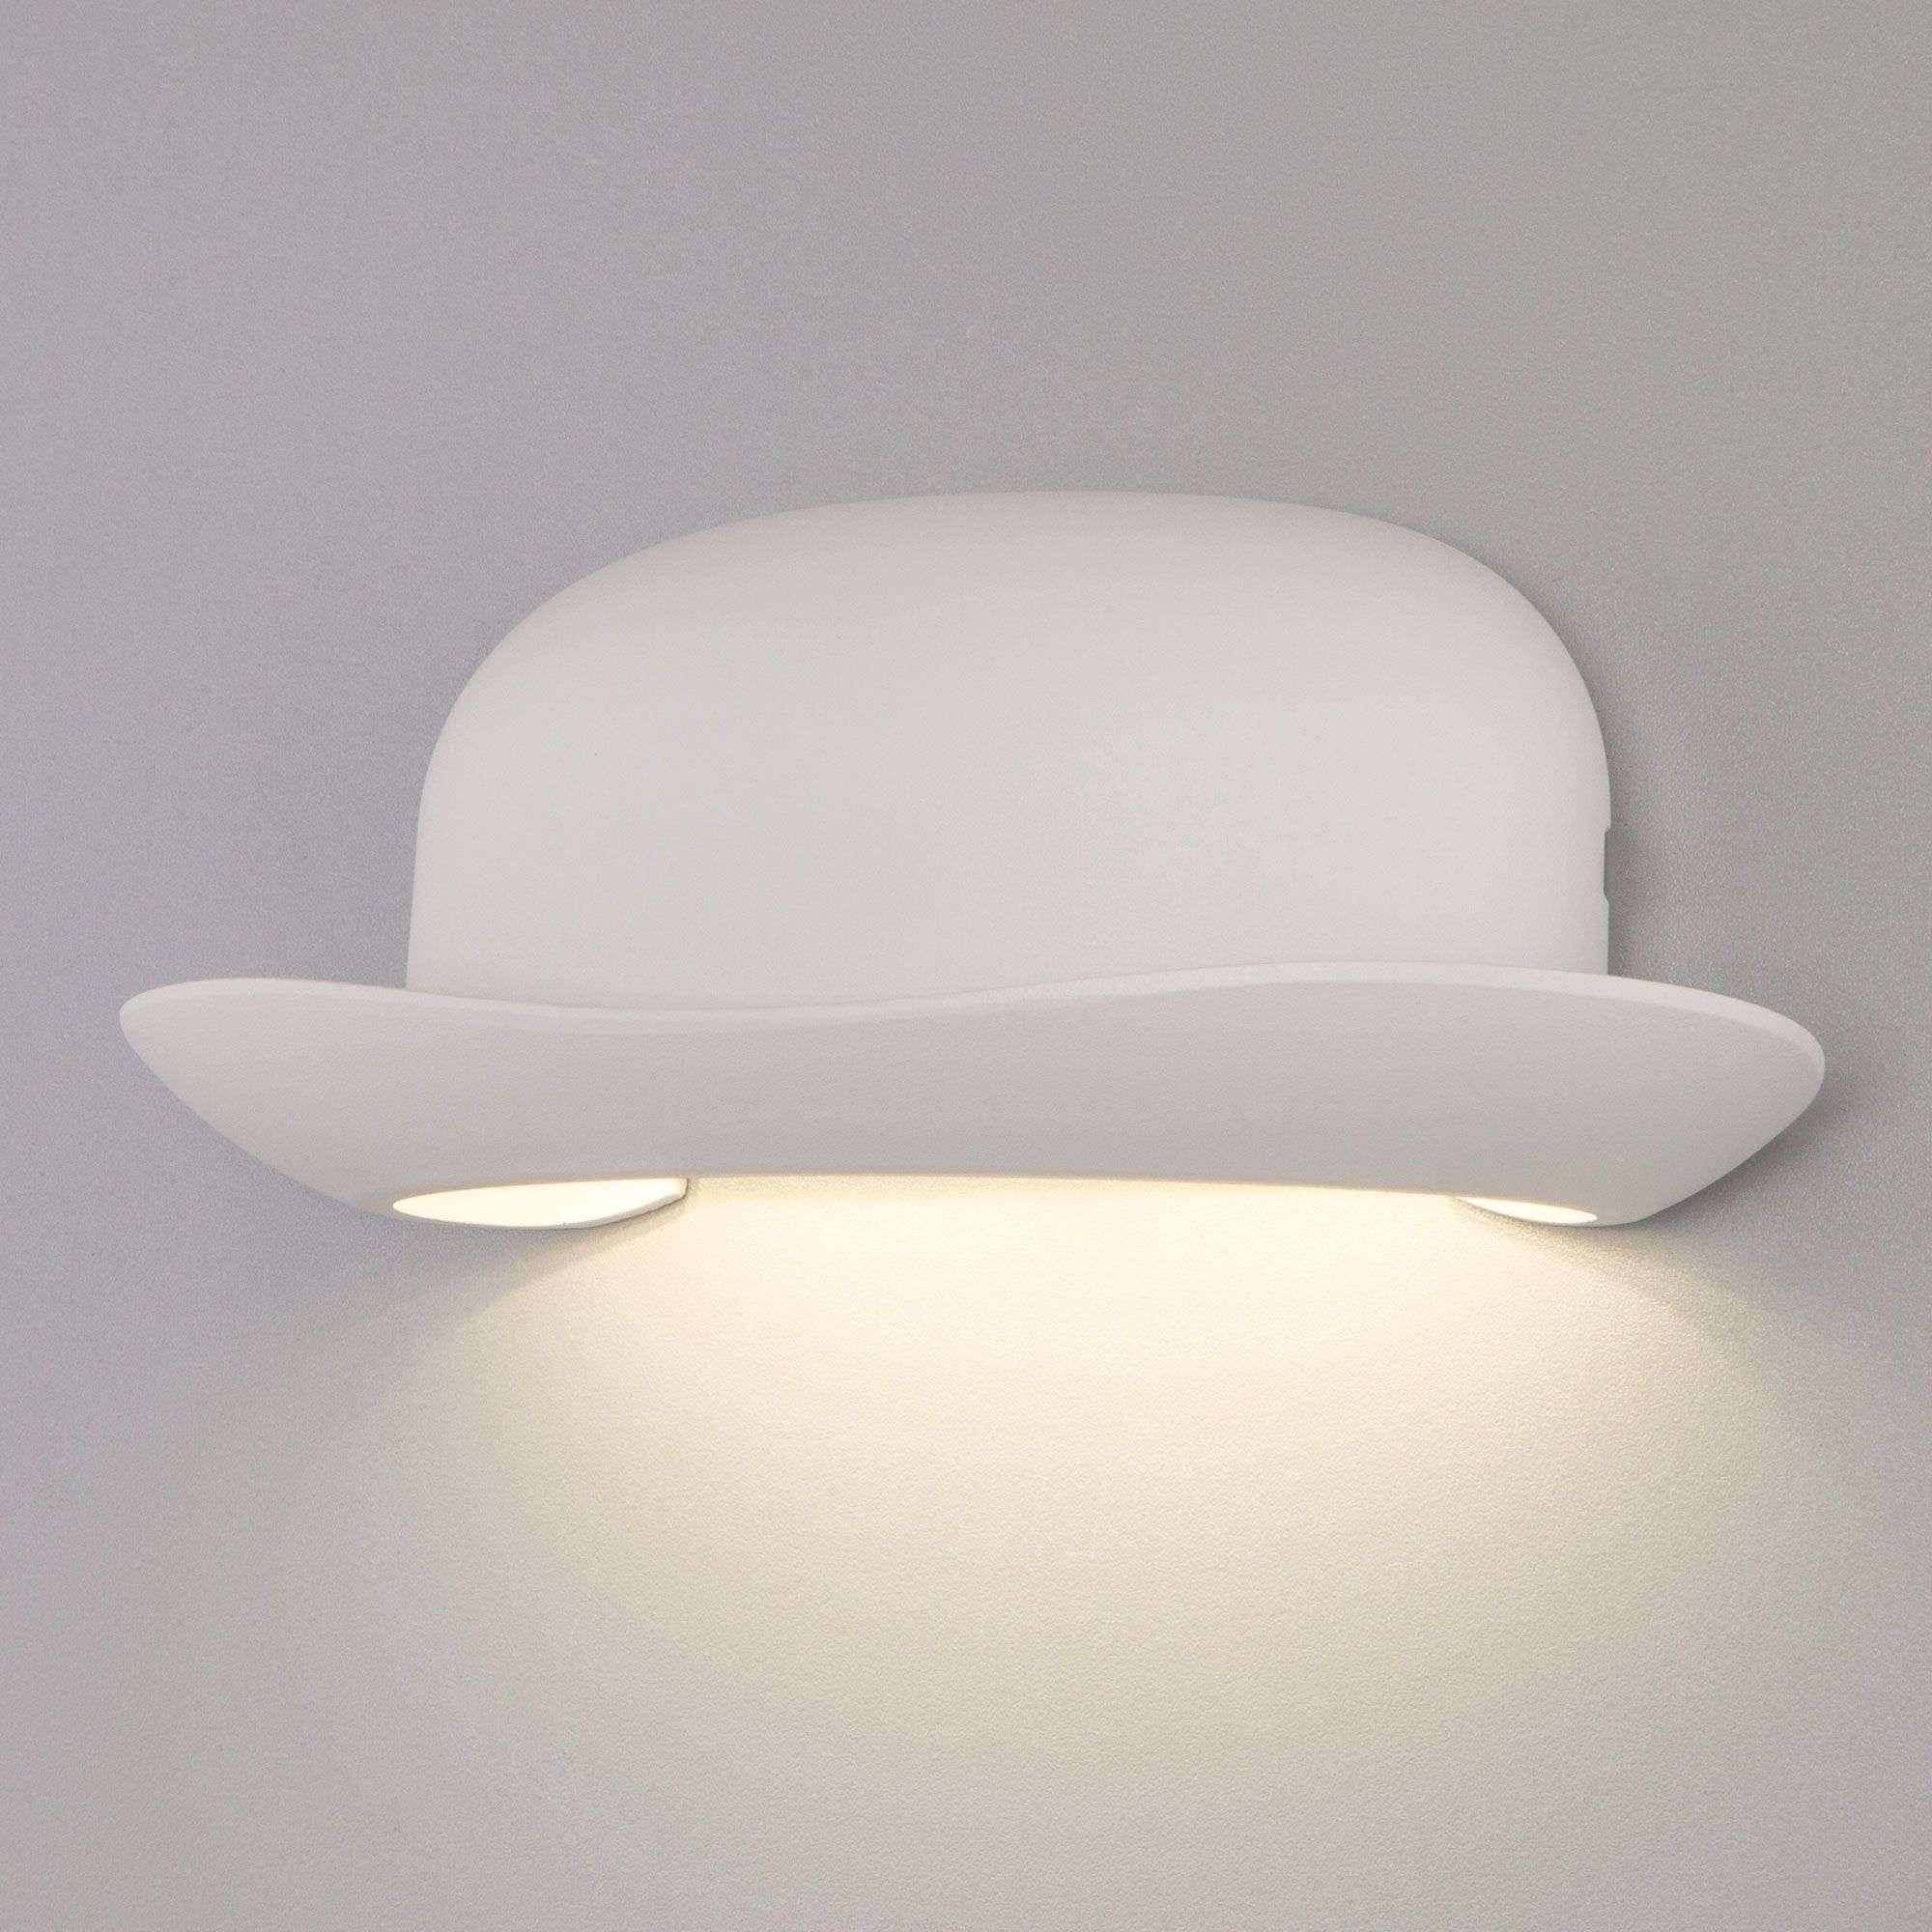 Настенный светодиодный светильник Keip LED белый Keip LED белый (MRL LED 1011)